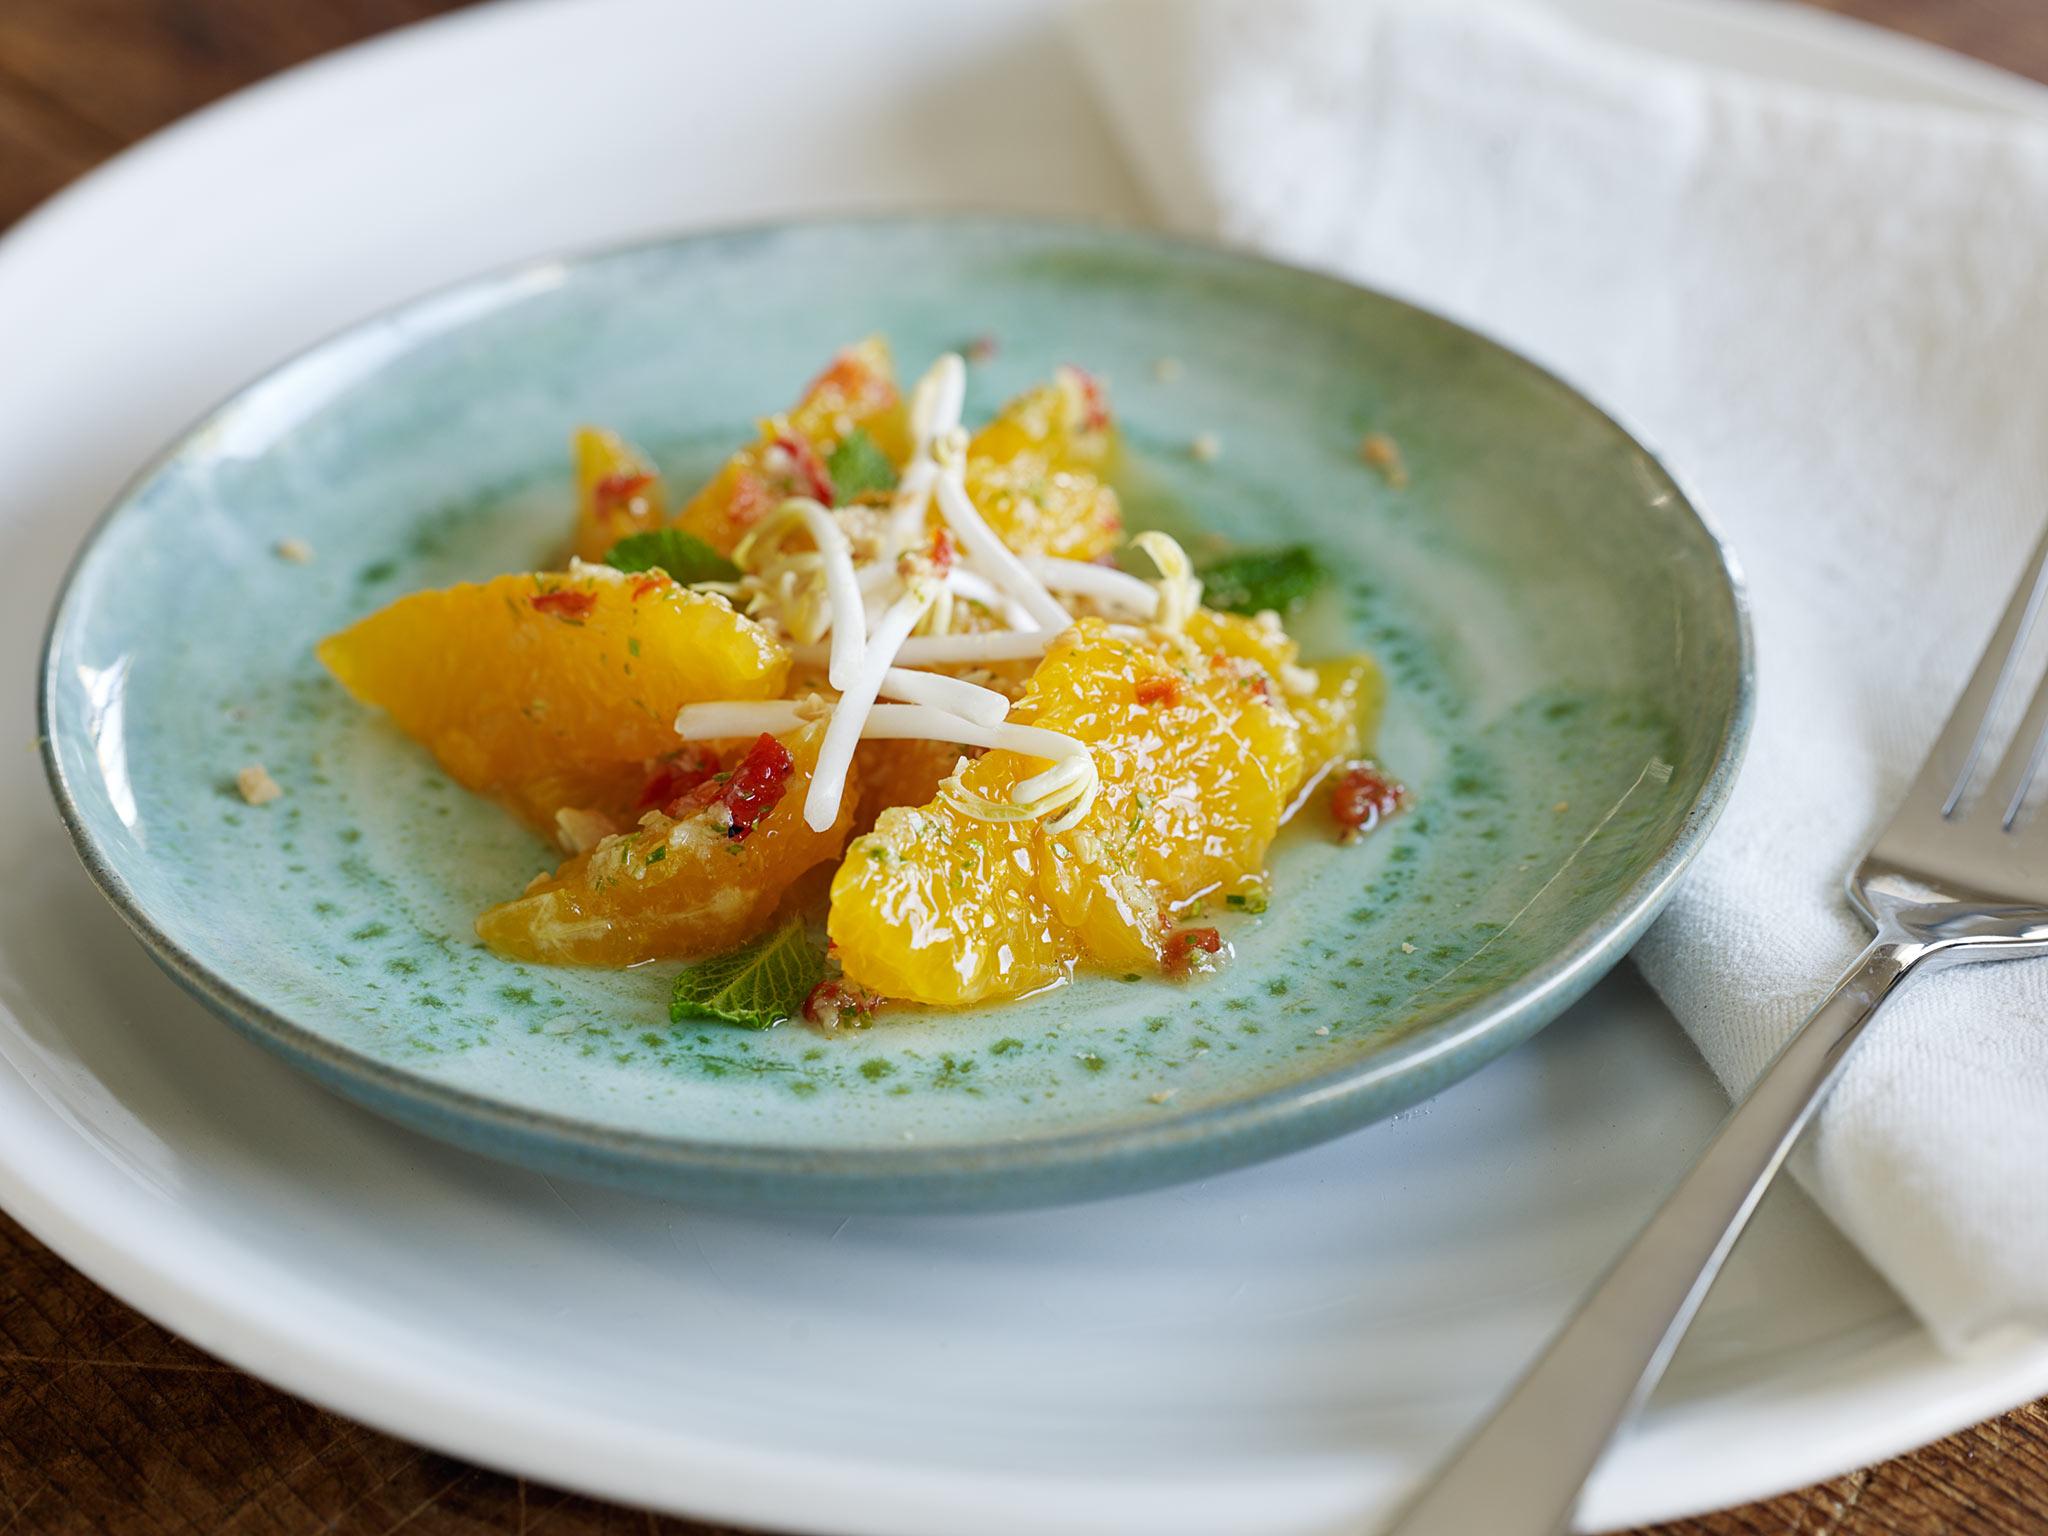 Grapefruit & orange salad